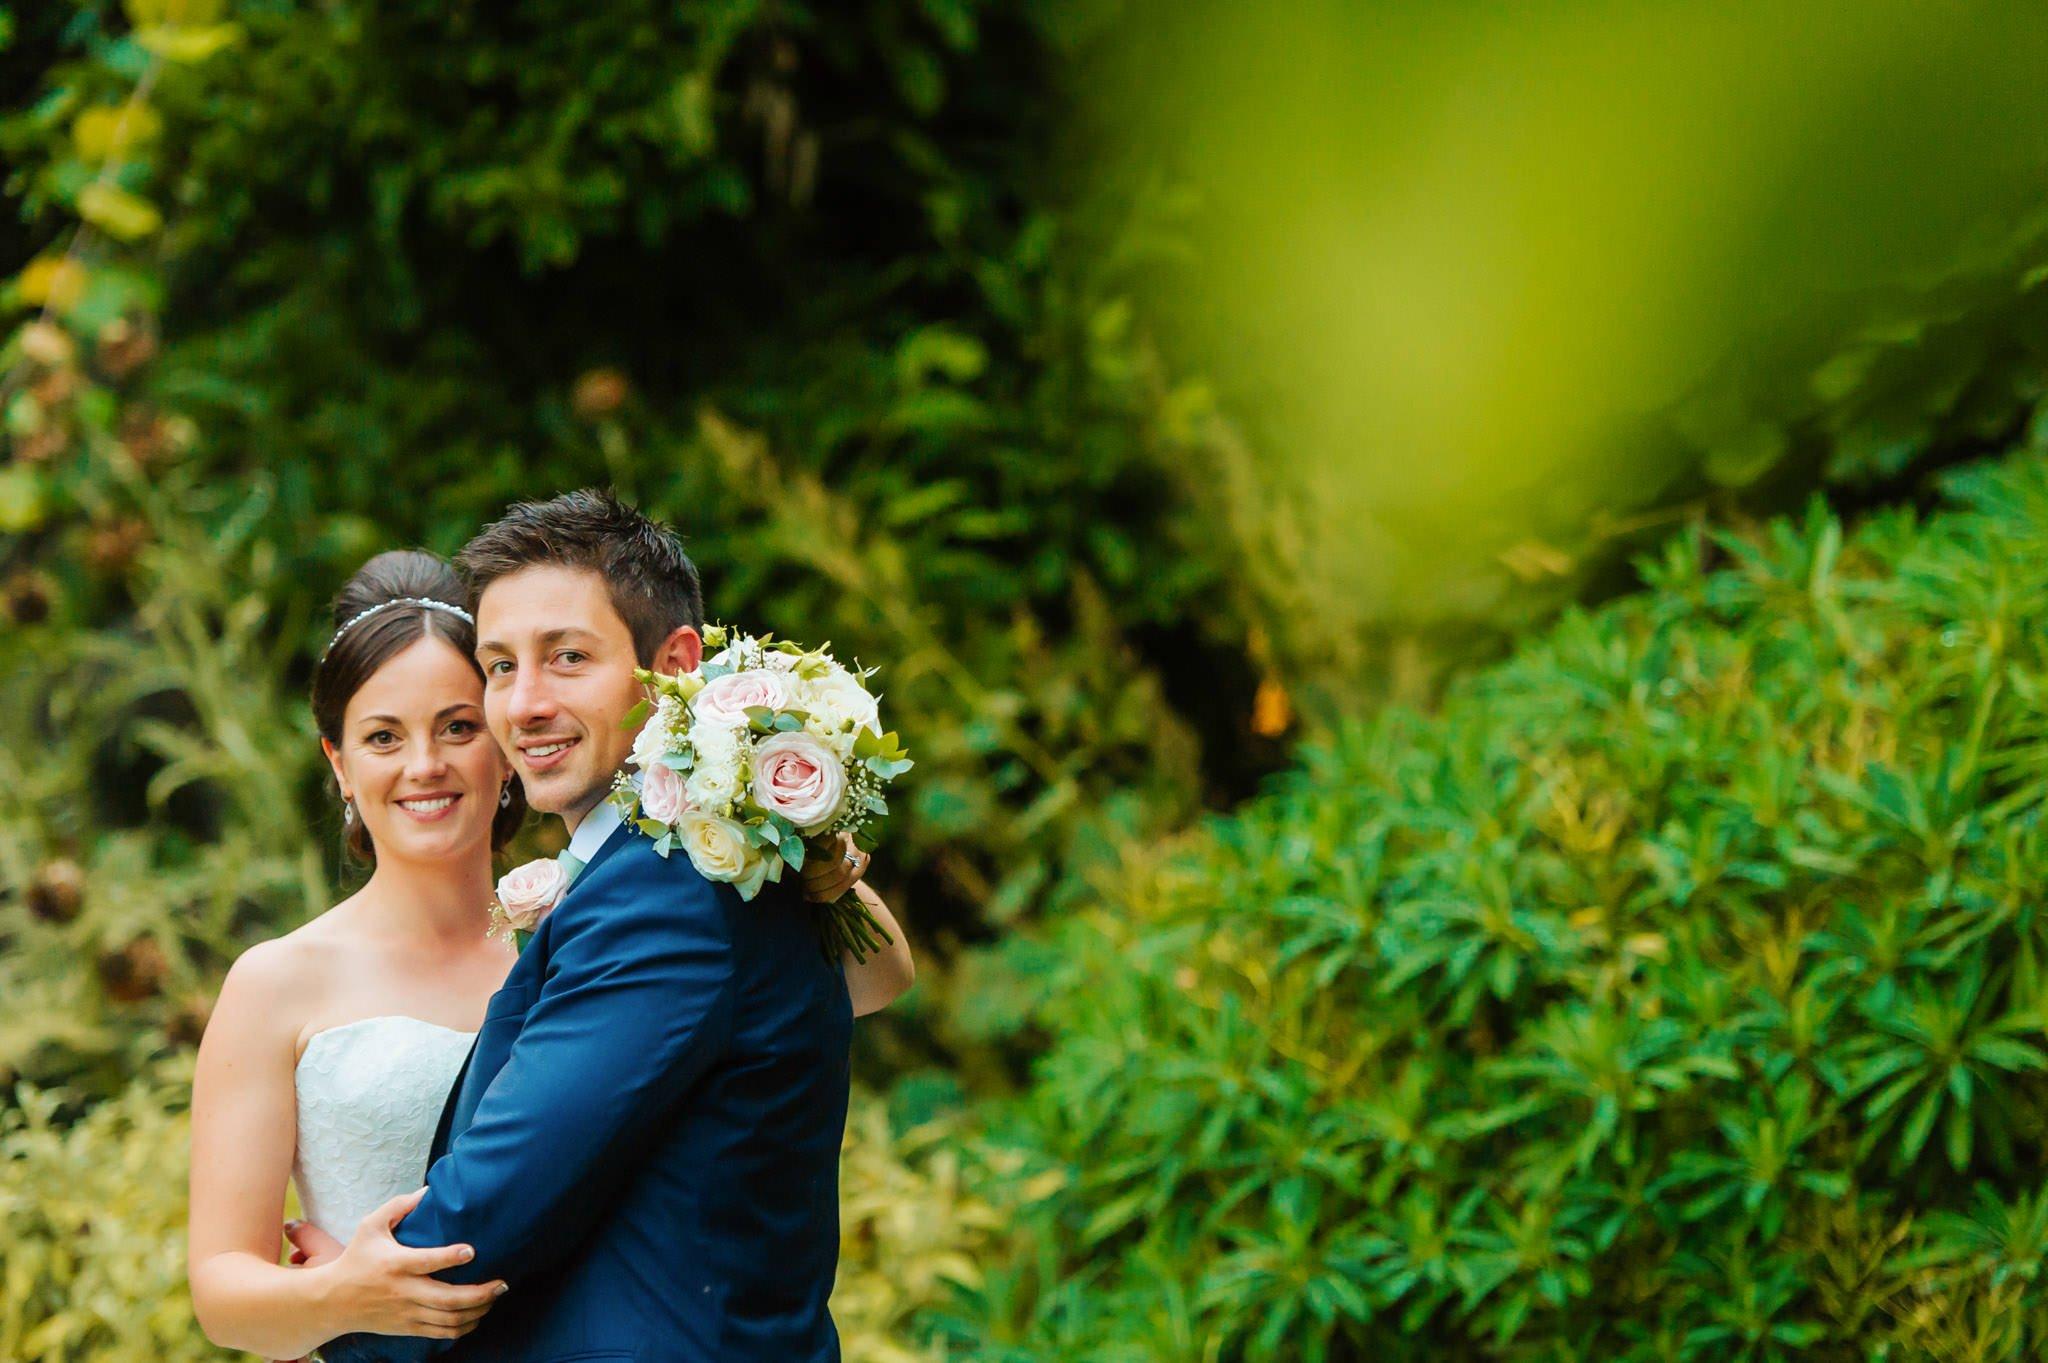 Eastnor Castle wedding photographer Herefordshire, West Midlands - Sarah + Dean 60